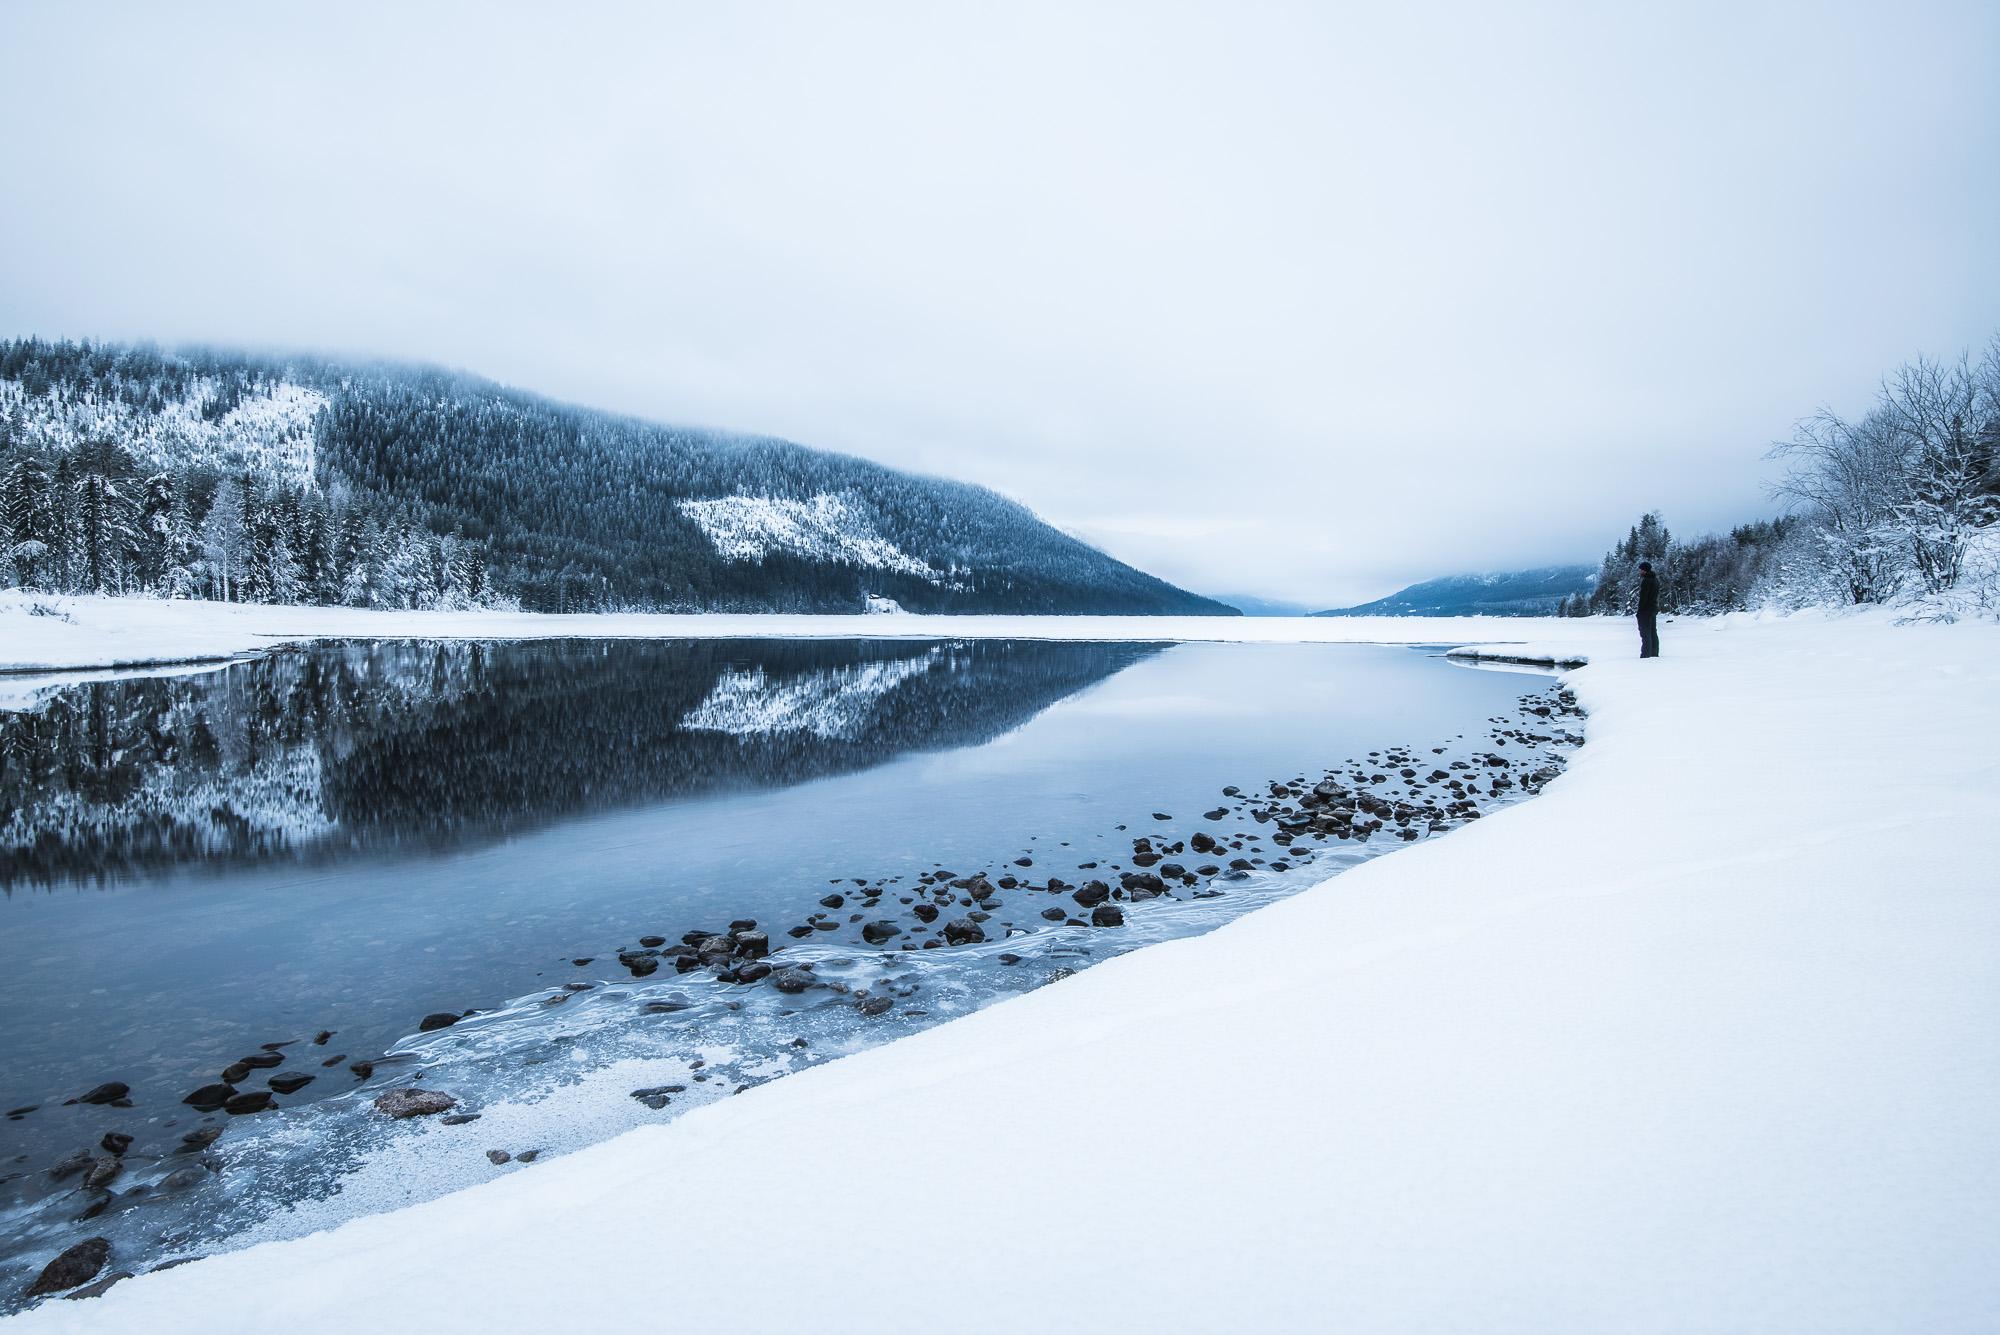 Engeren, Hedmark fylke, Norge